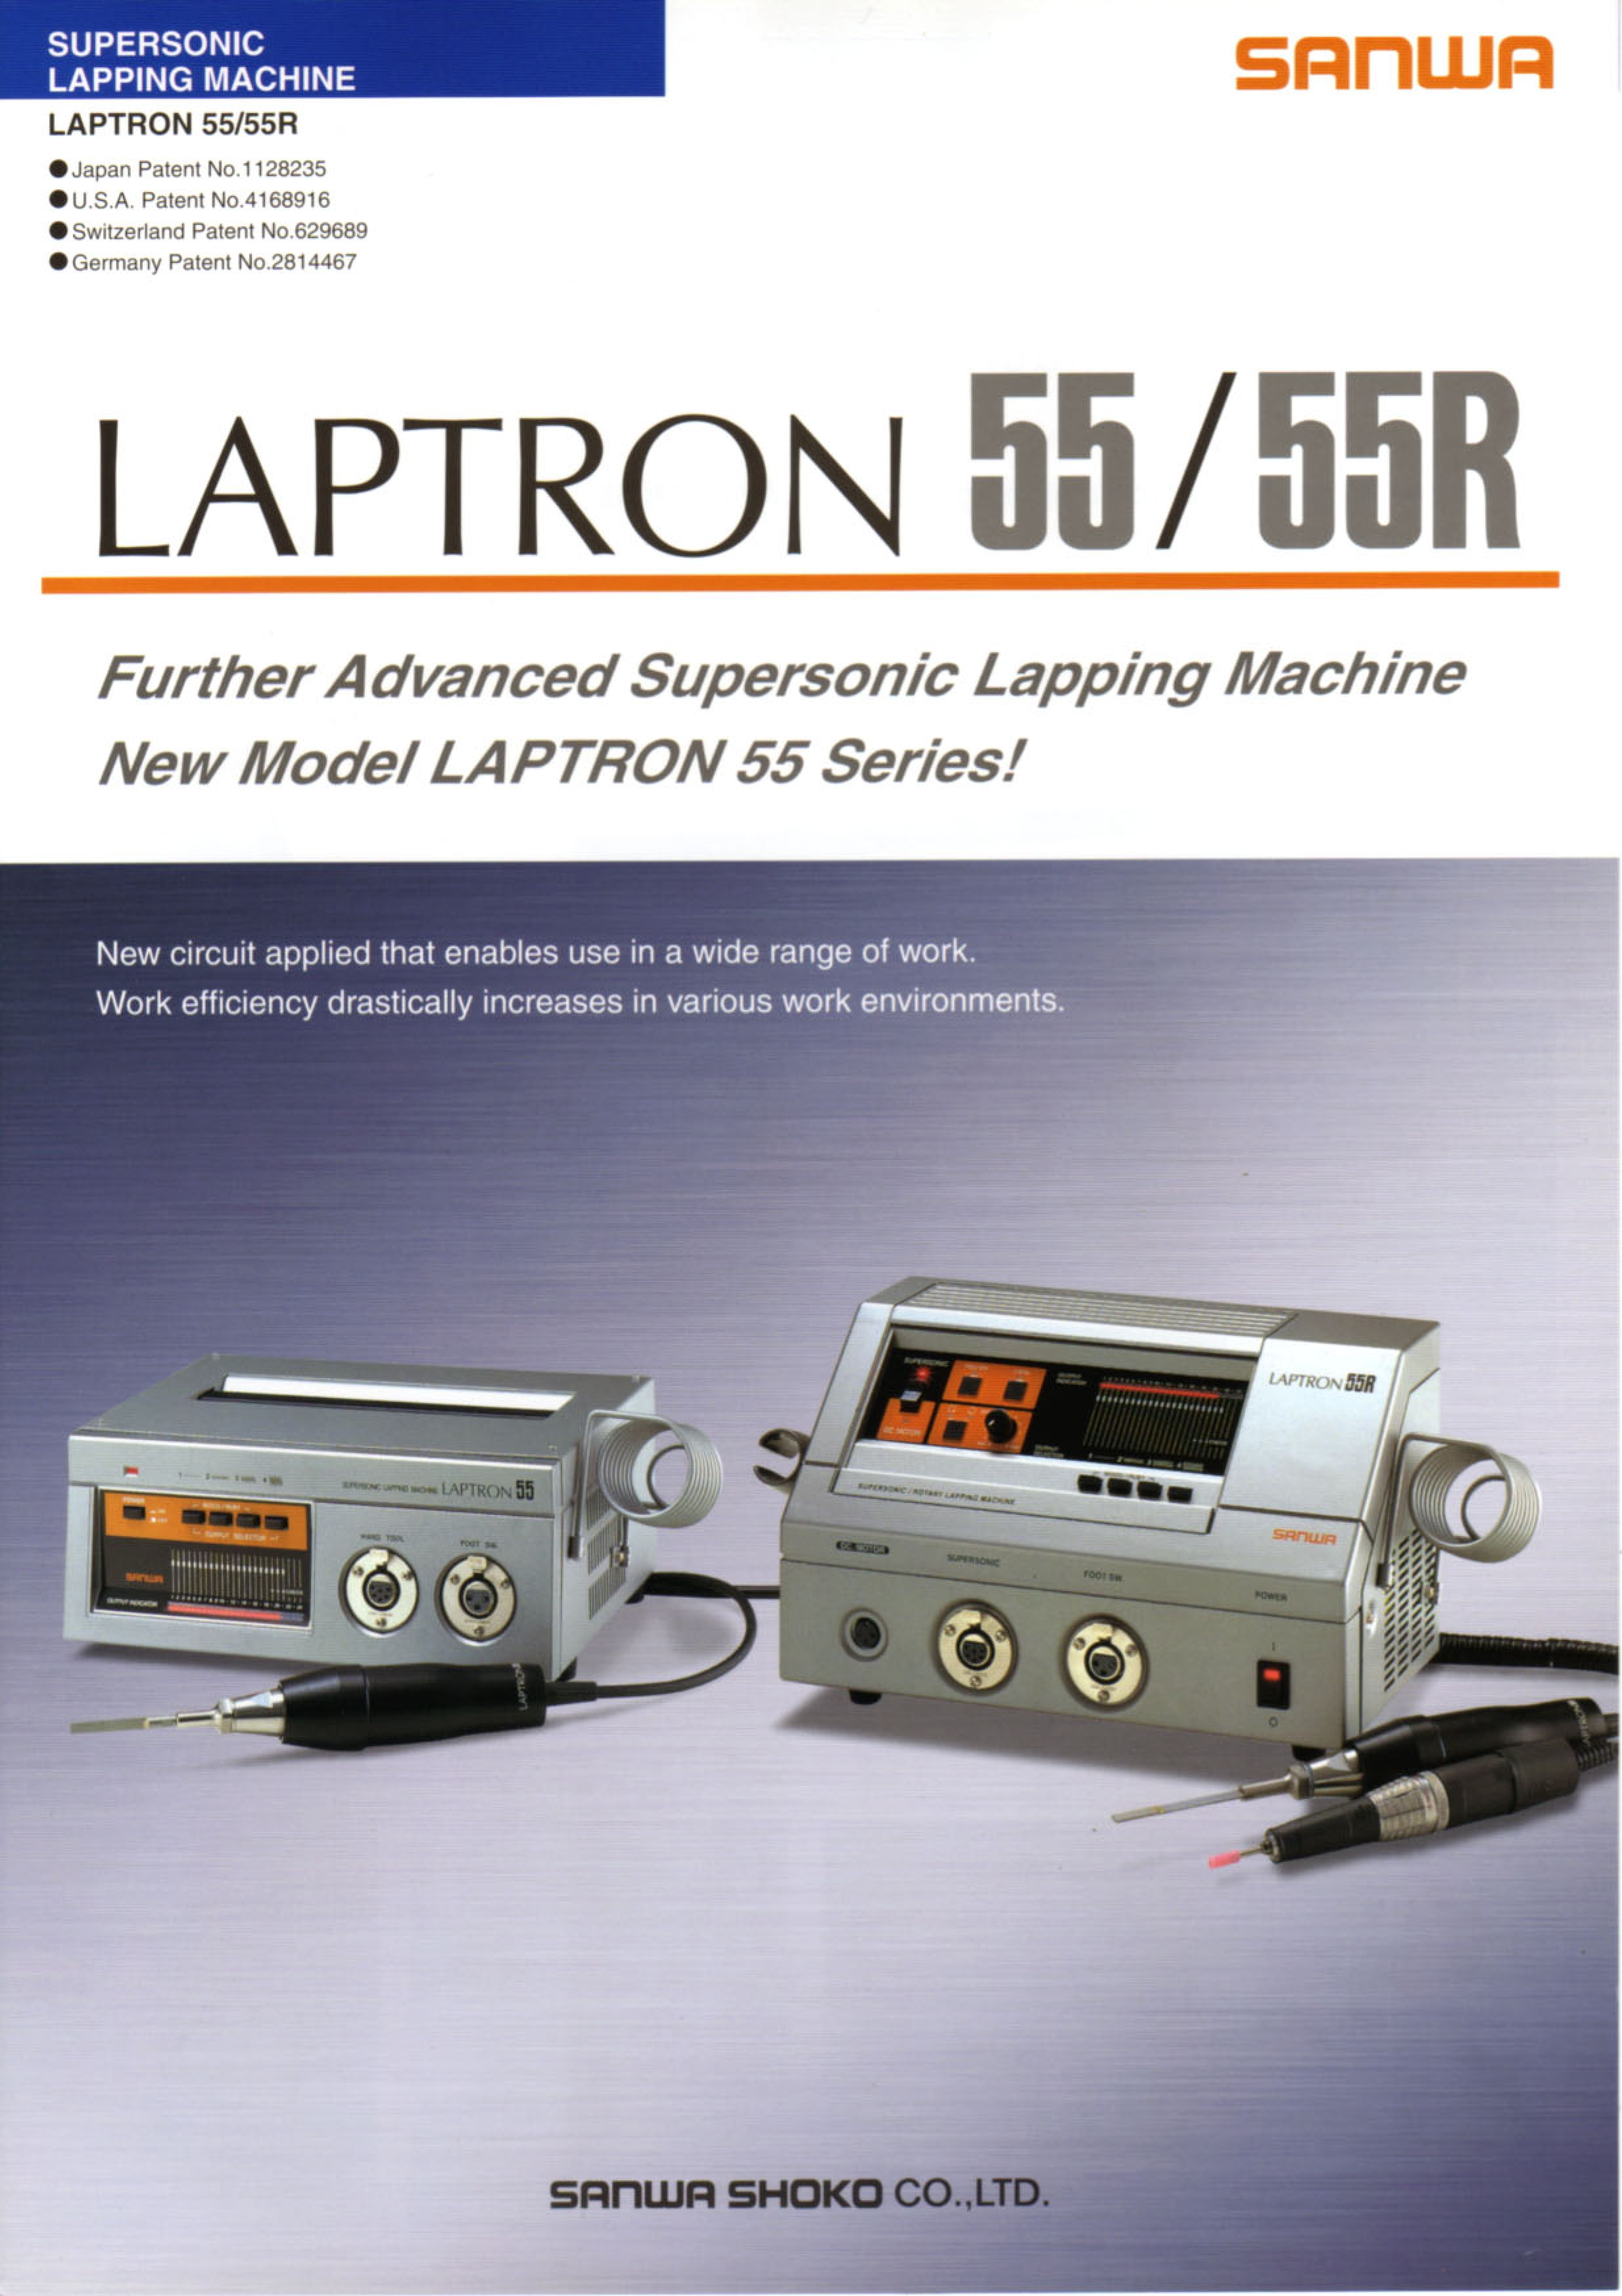 Máy Mài Supersonic Lapping Machine LAPTRON 55